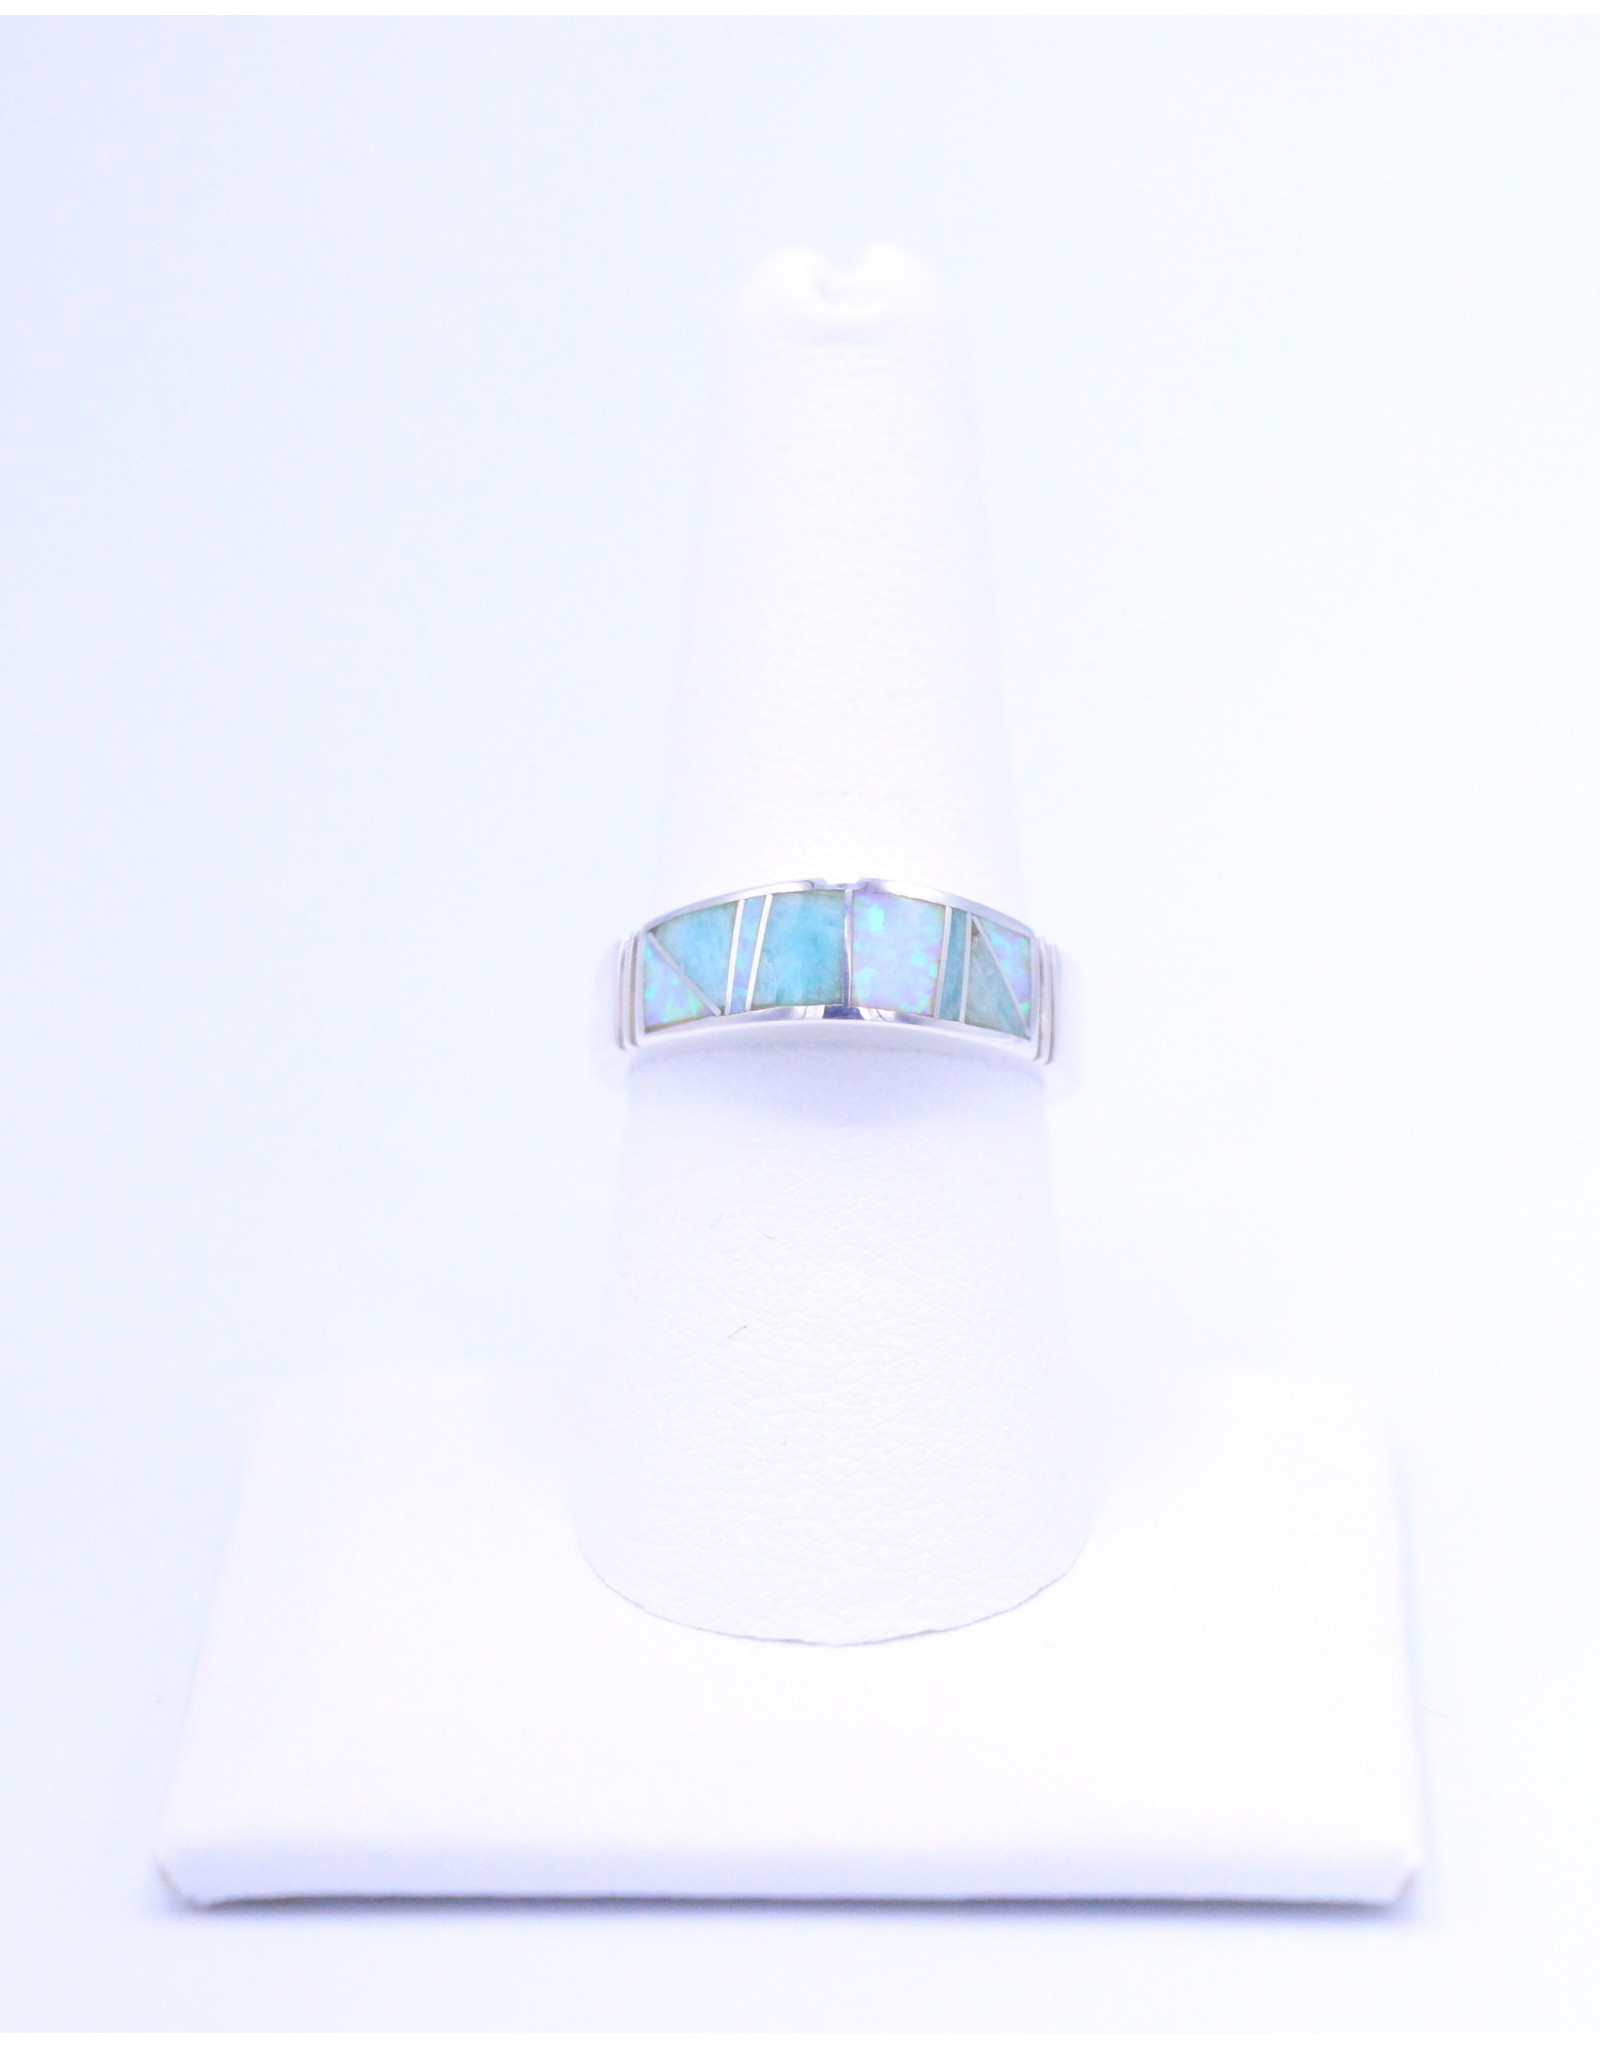 Amazing Lite Ring SIZE 8 - R134